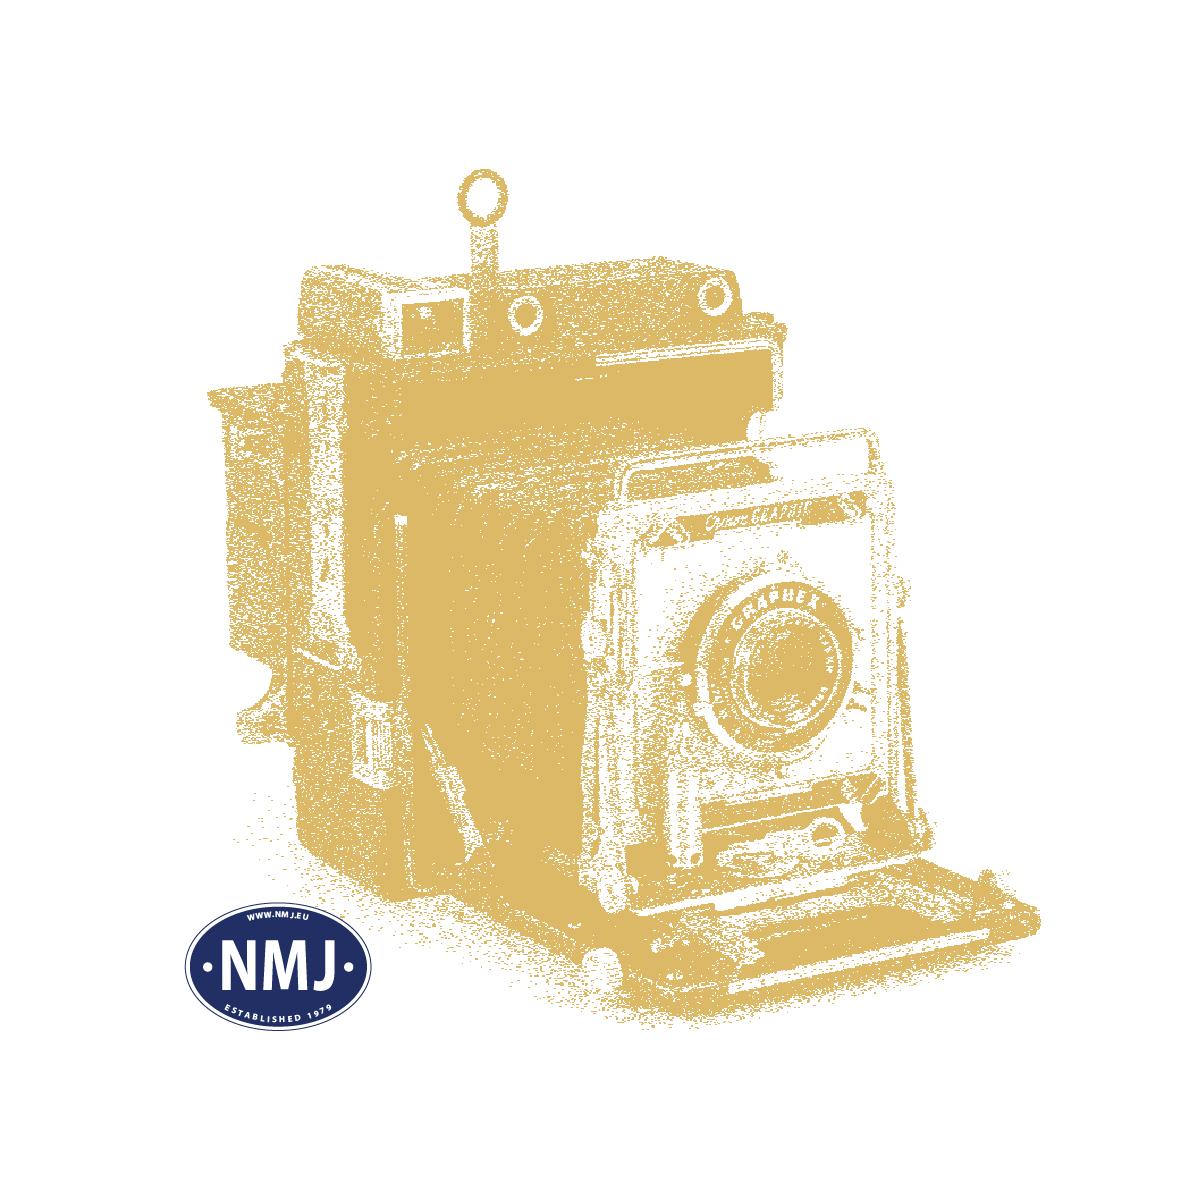 NMJT145001 - NMJ Topline NSB Di3b 641 Gammeldesign, 0-Skala 1:45